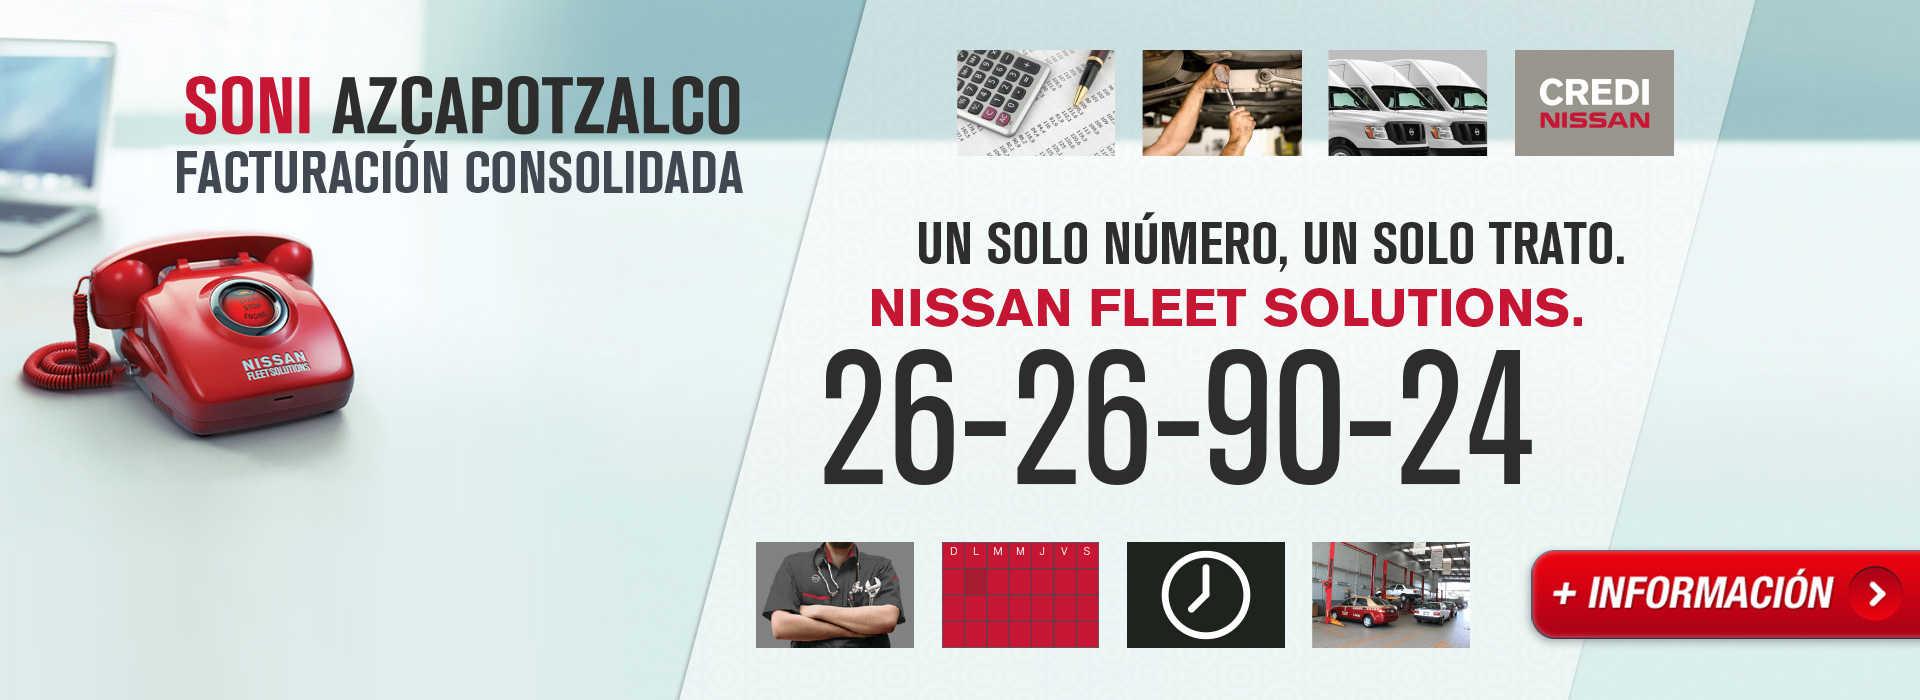 Un solo número, un solo trato - Nissan Fleet Solutions